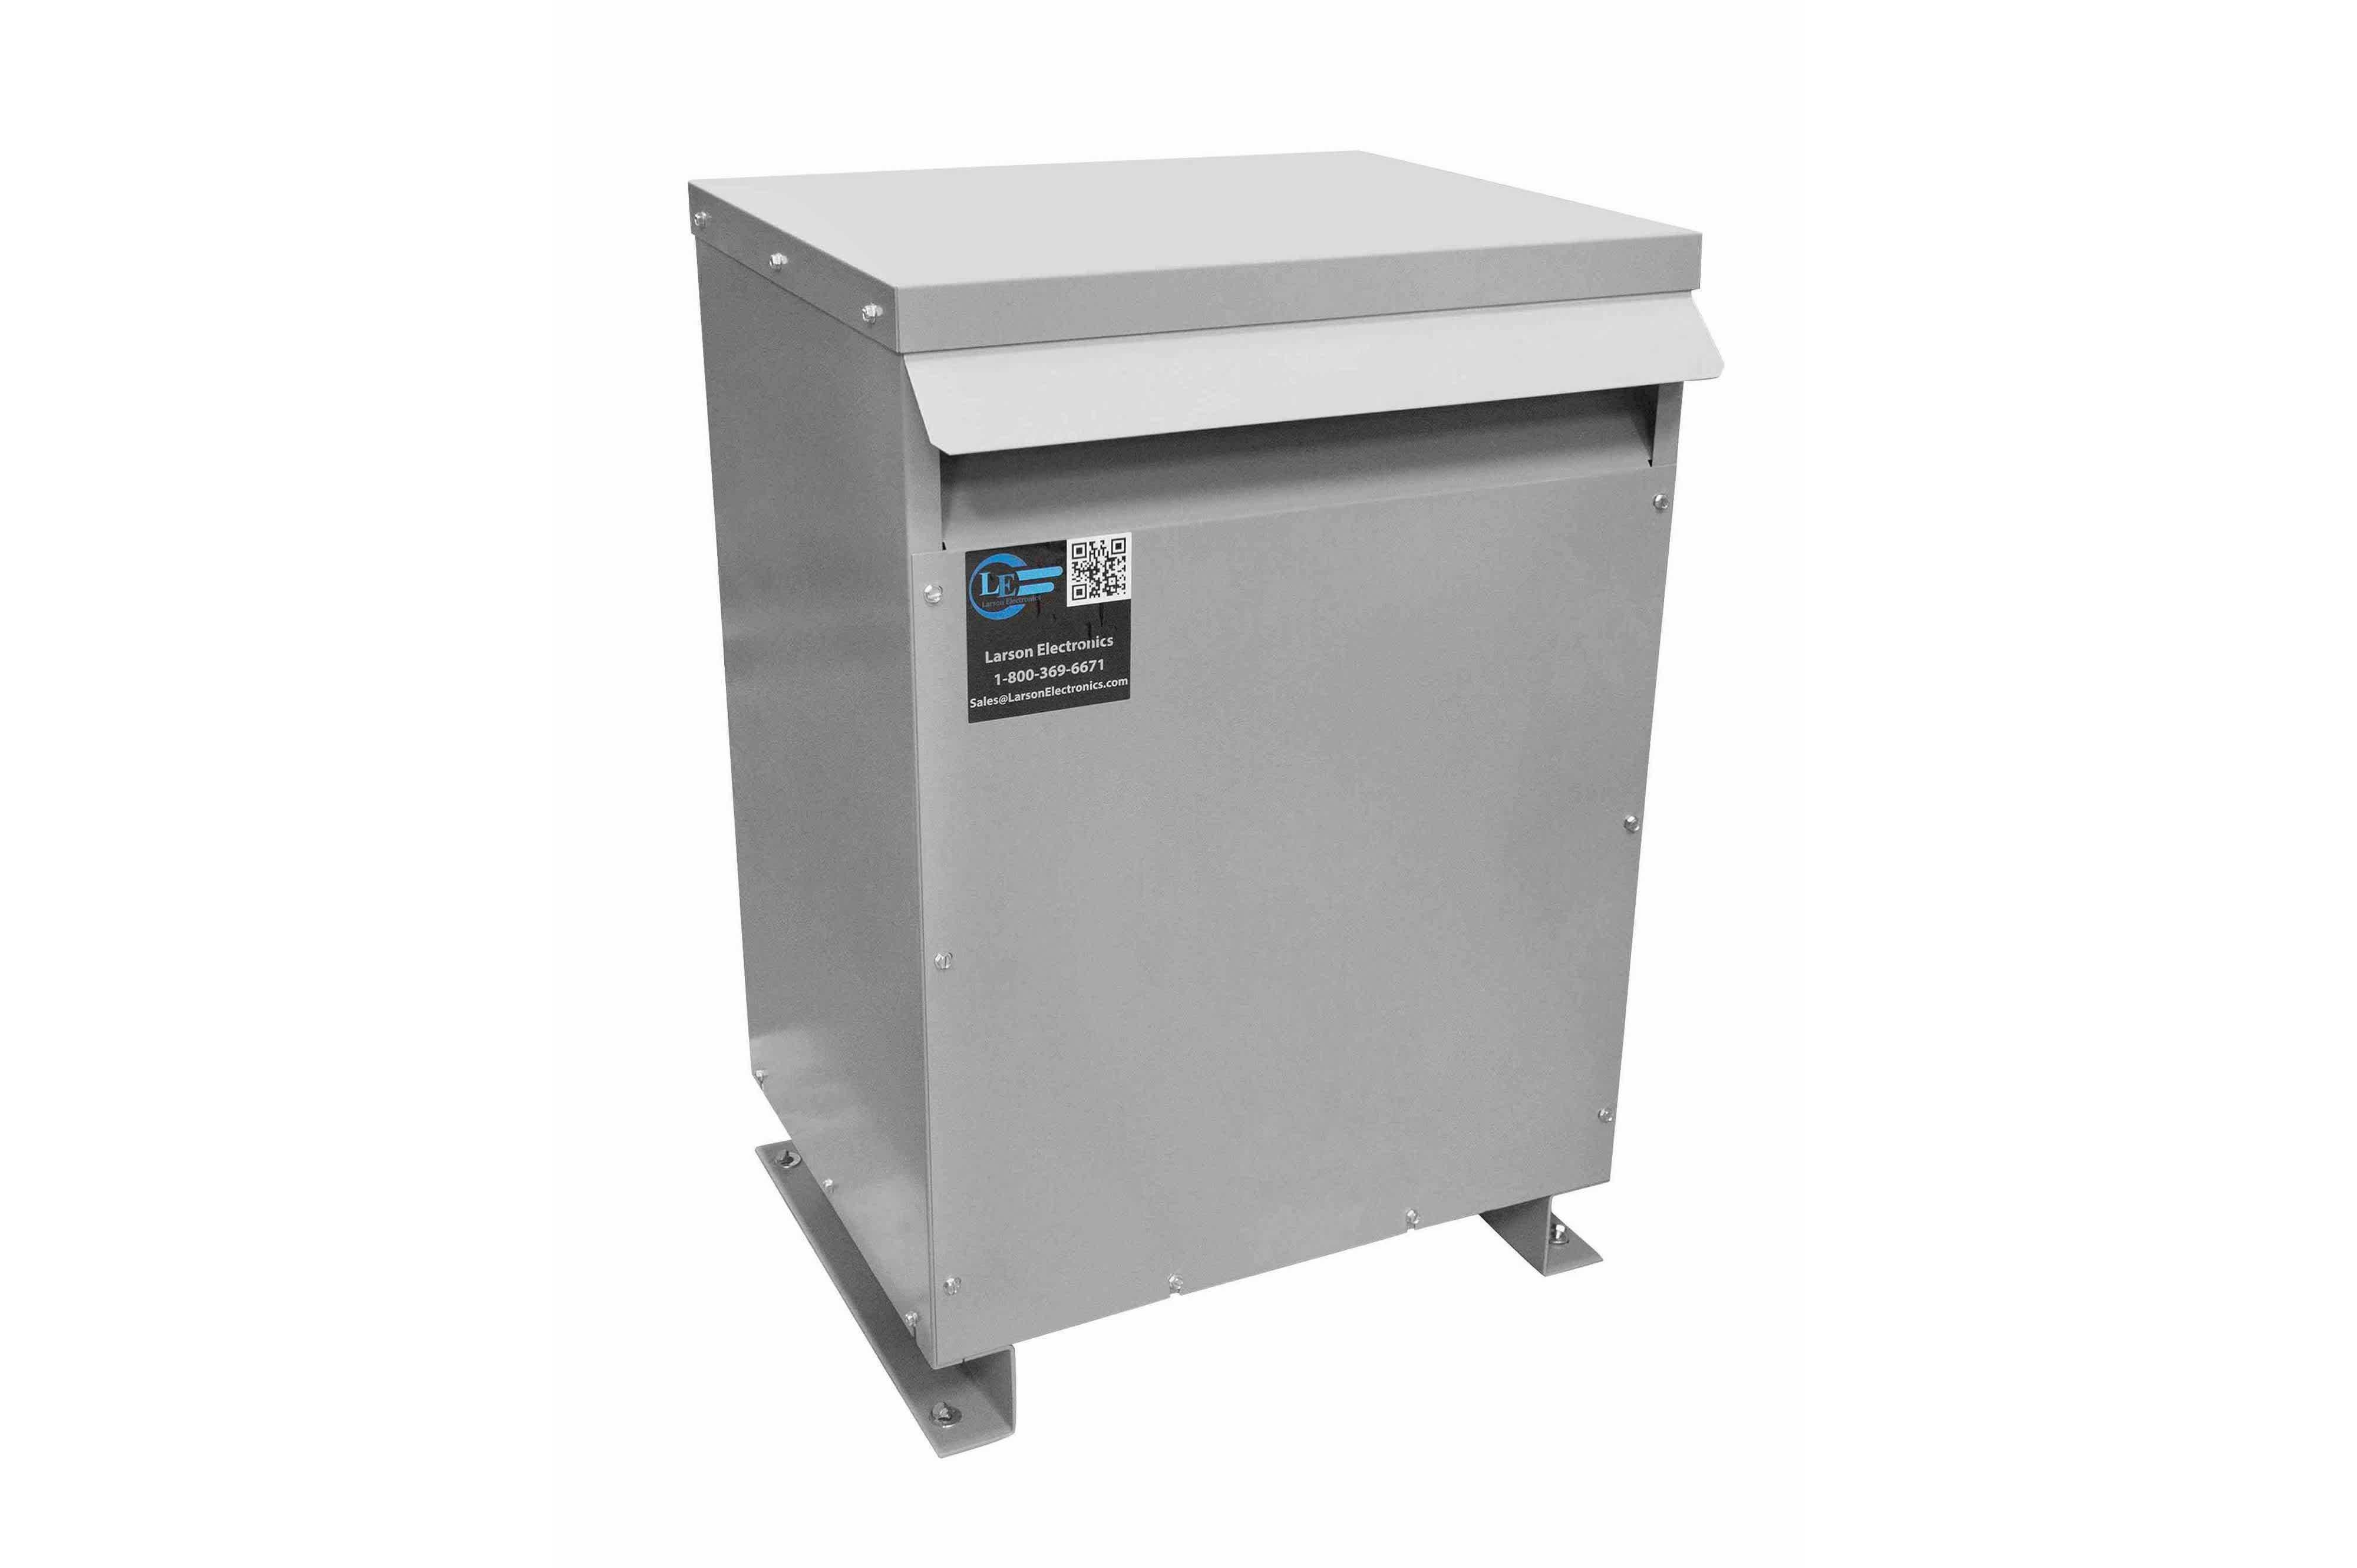 800 kVA 3PH Isolation Transformer, 460V Wye Primary, 380V Delta Secondary, N3R, Ventilated, 60 Hz